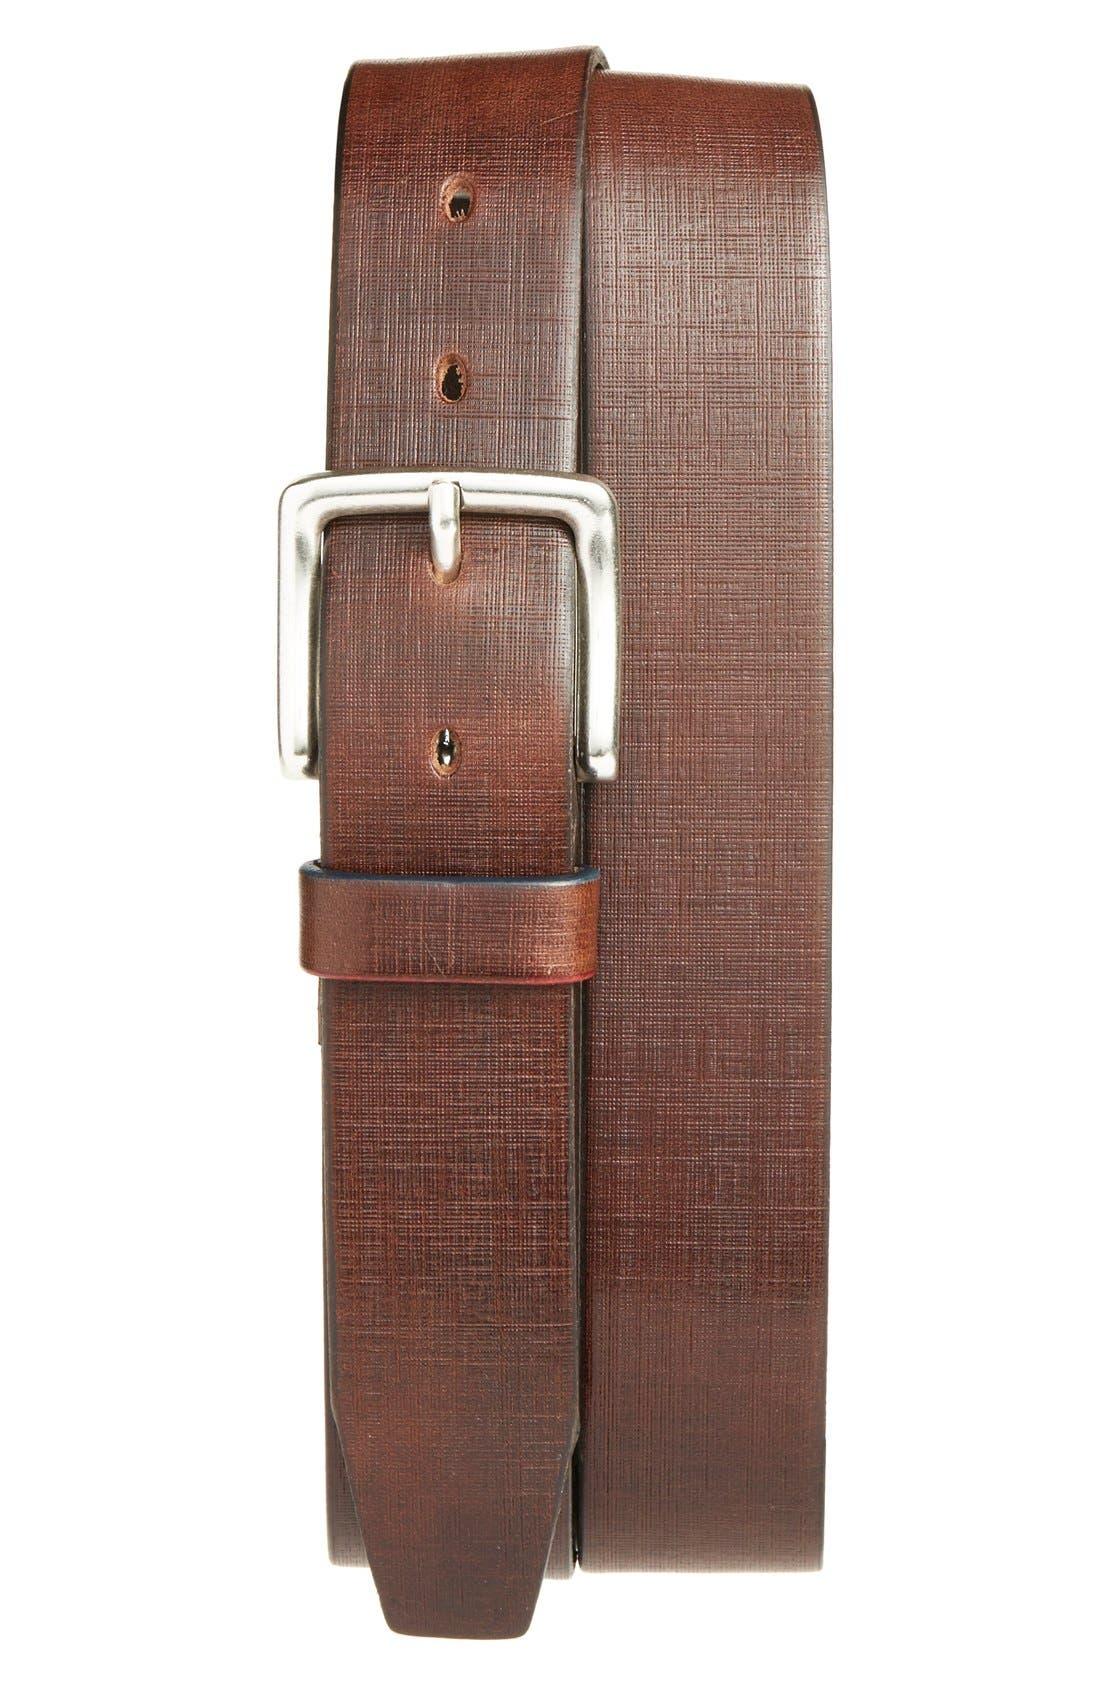 TRAFALGAR Leather Belt